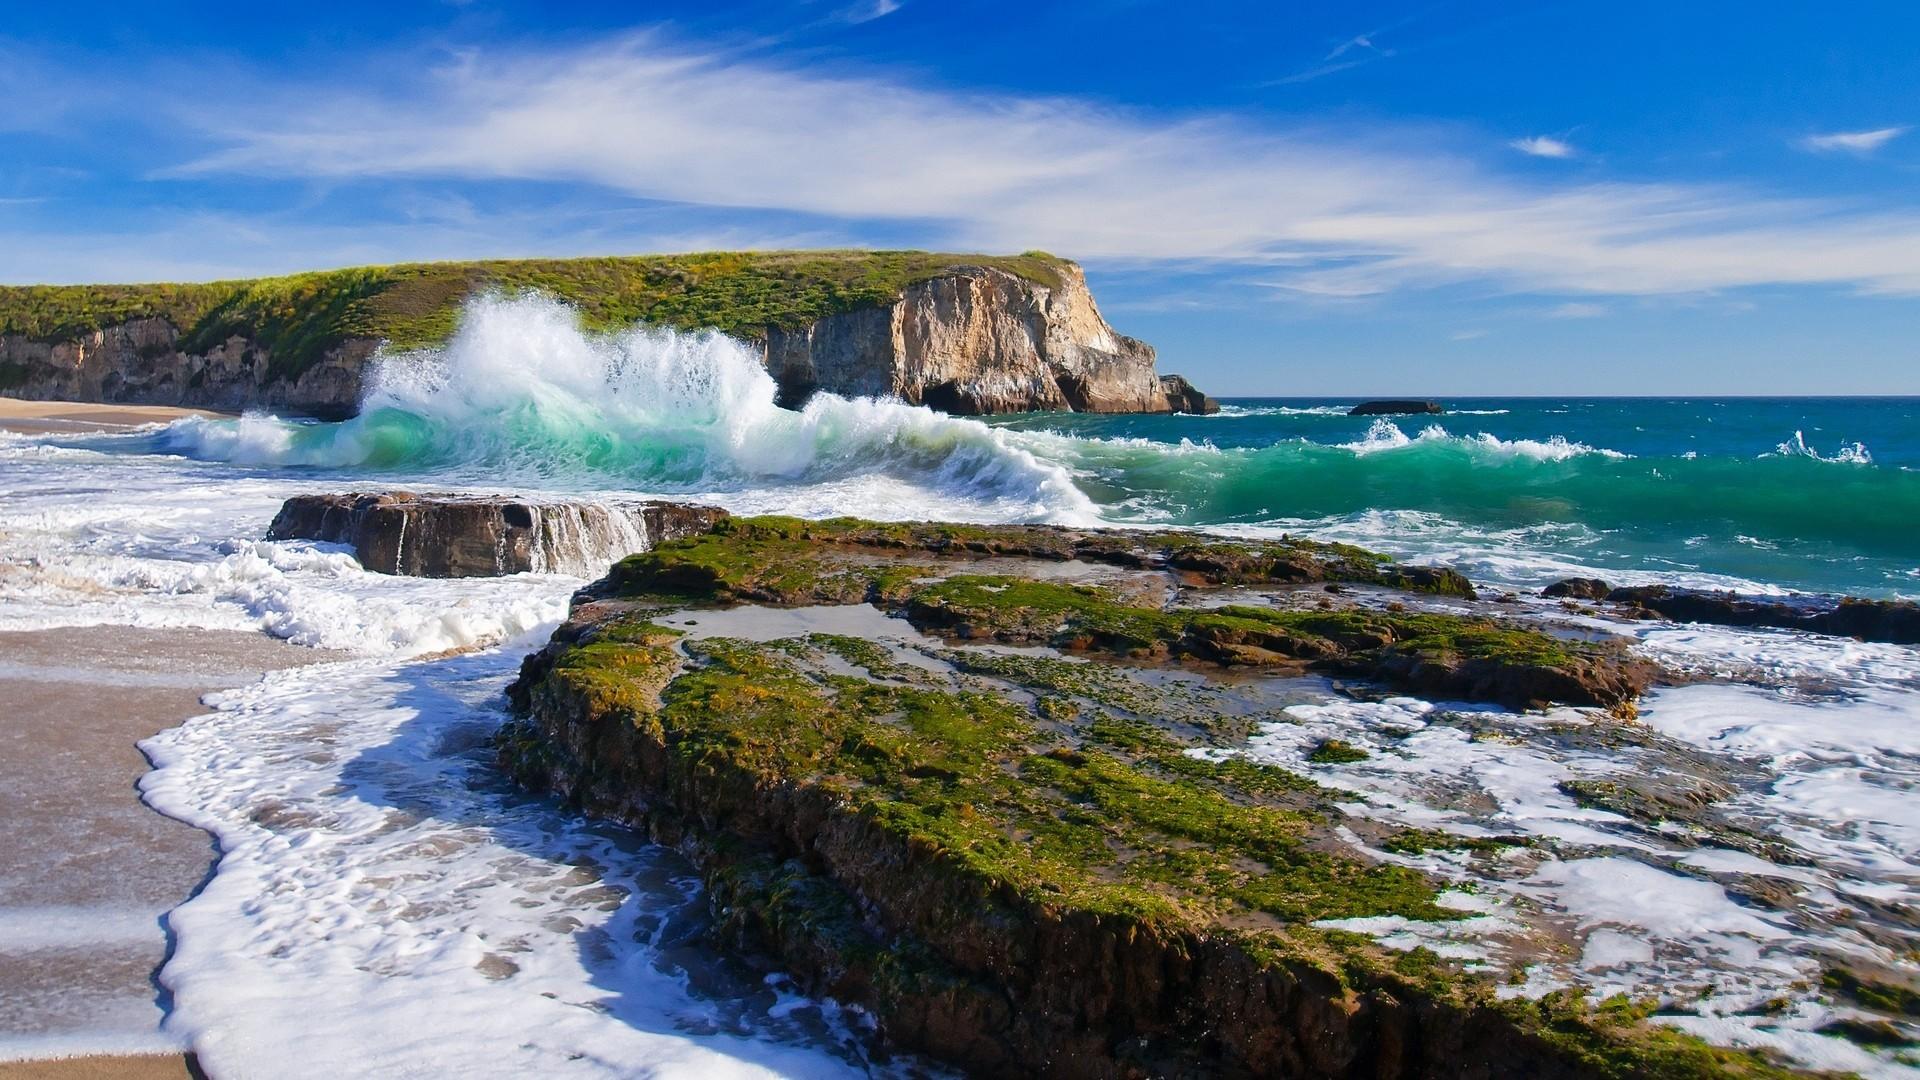 Wallpaper Landscape Sea Bay Rock Shore Beach Waves Coast